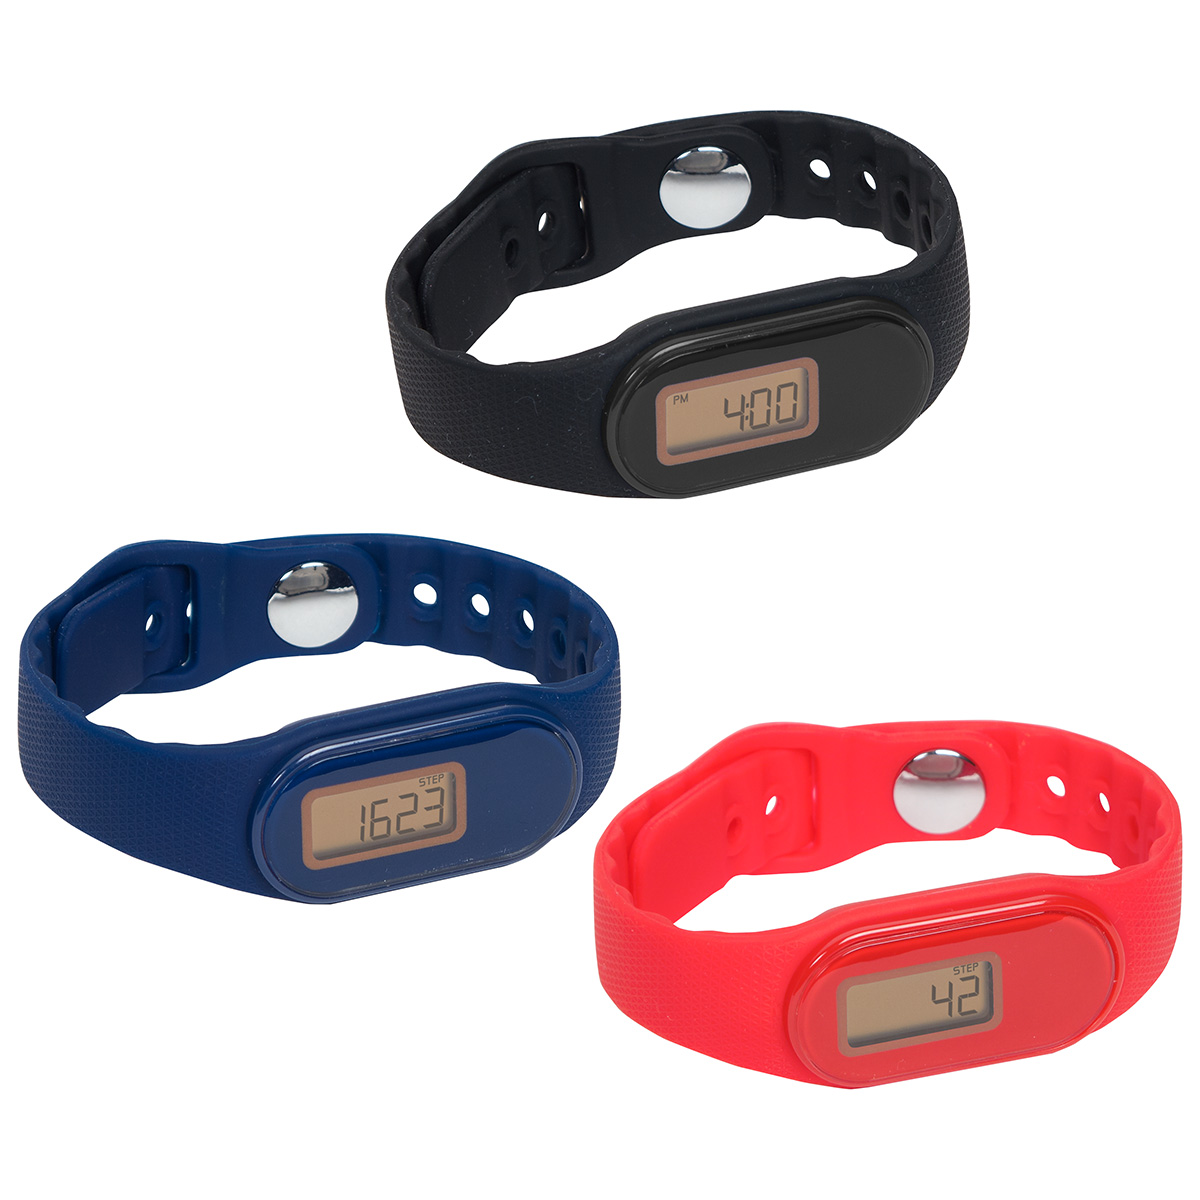 Tap 'N Read Waterproof Fitness Tracker + Pedometer Watch, WHF-TN16, 1 Colour Imprint